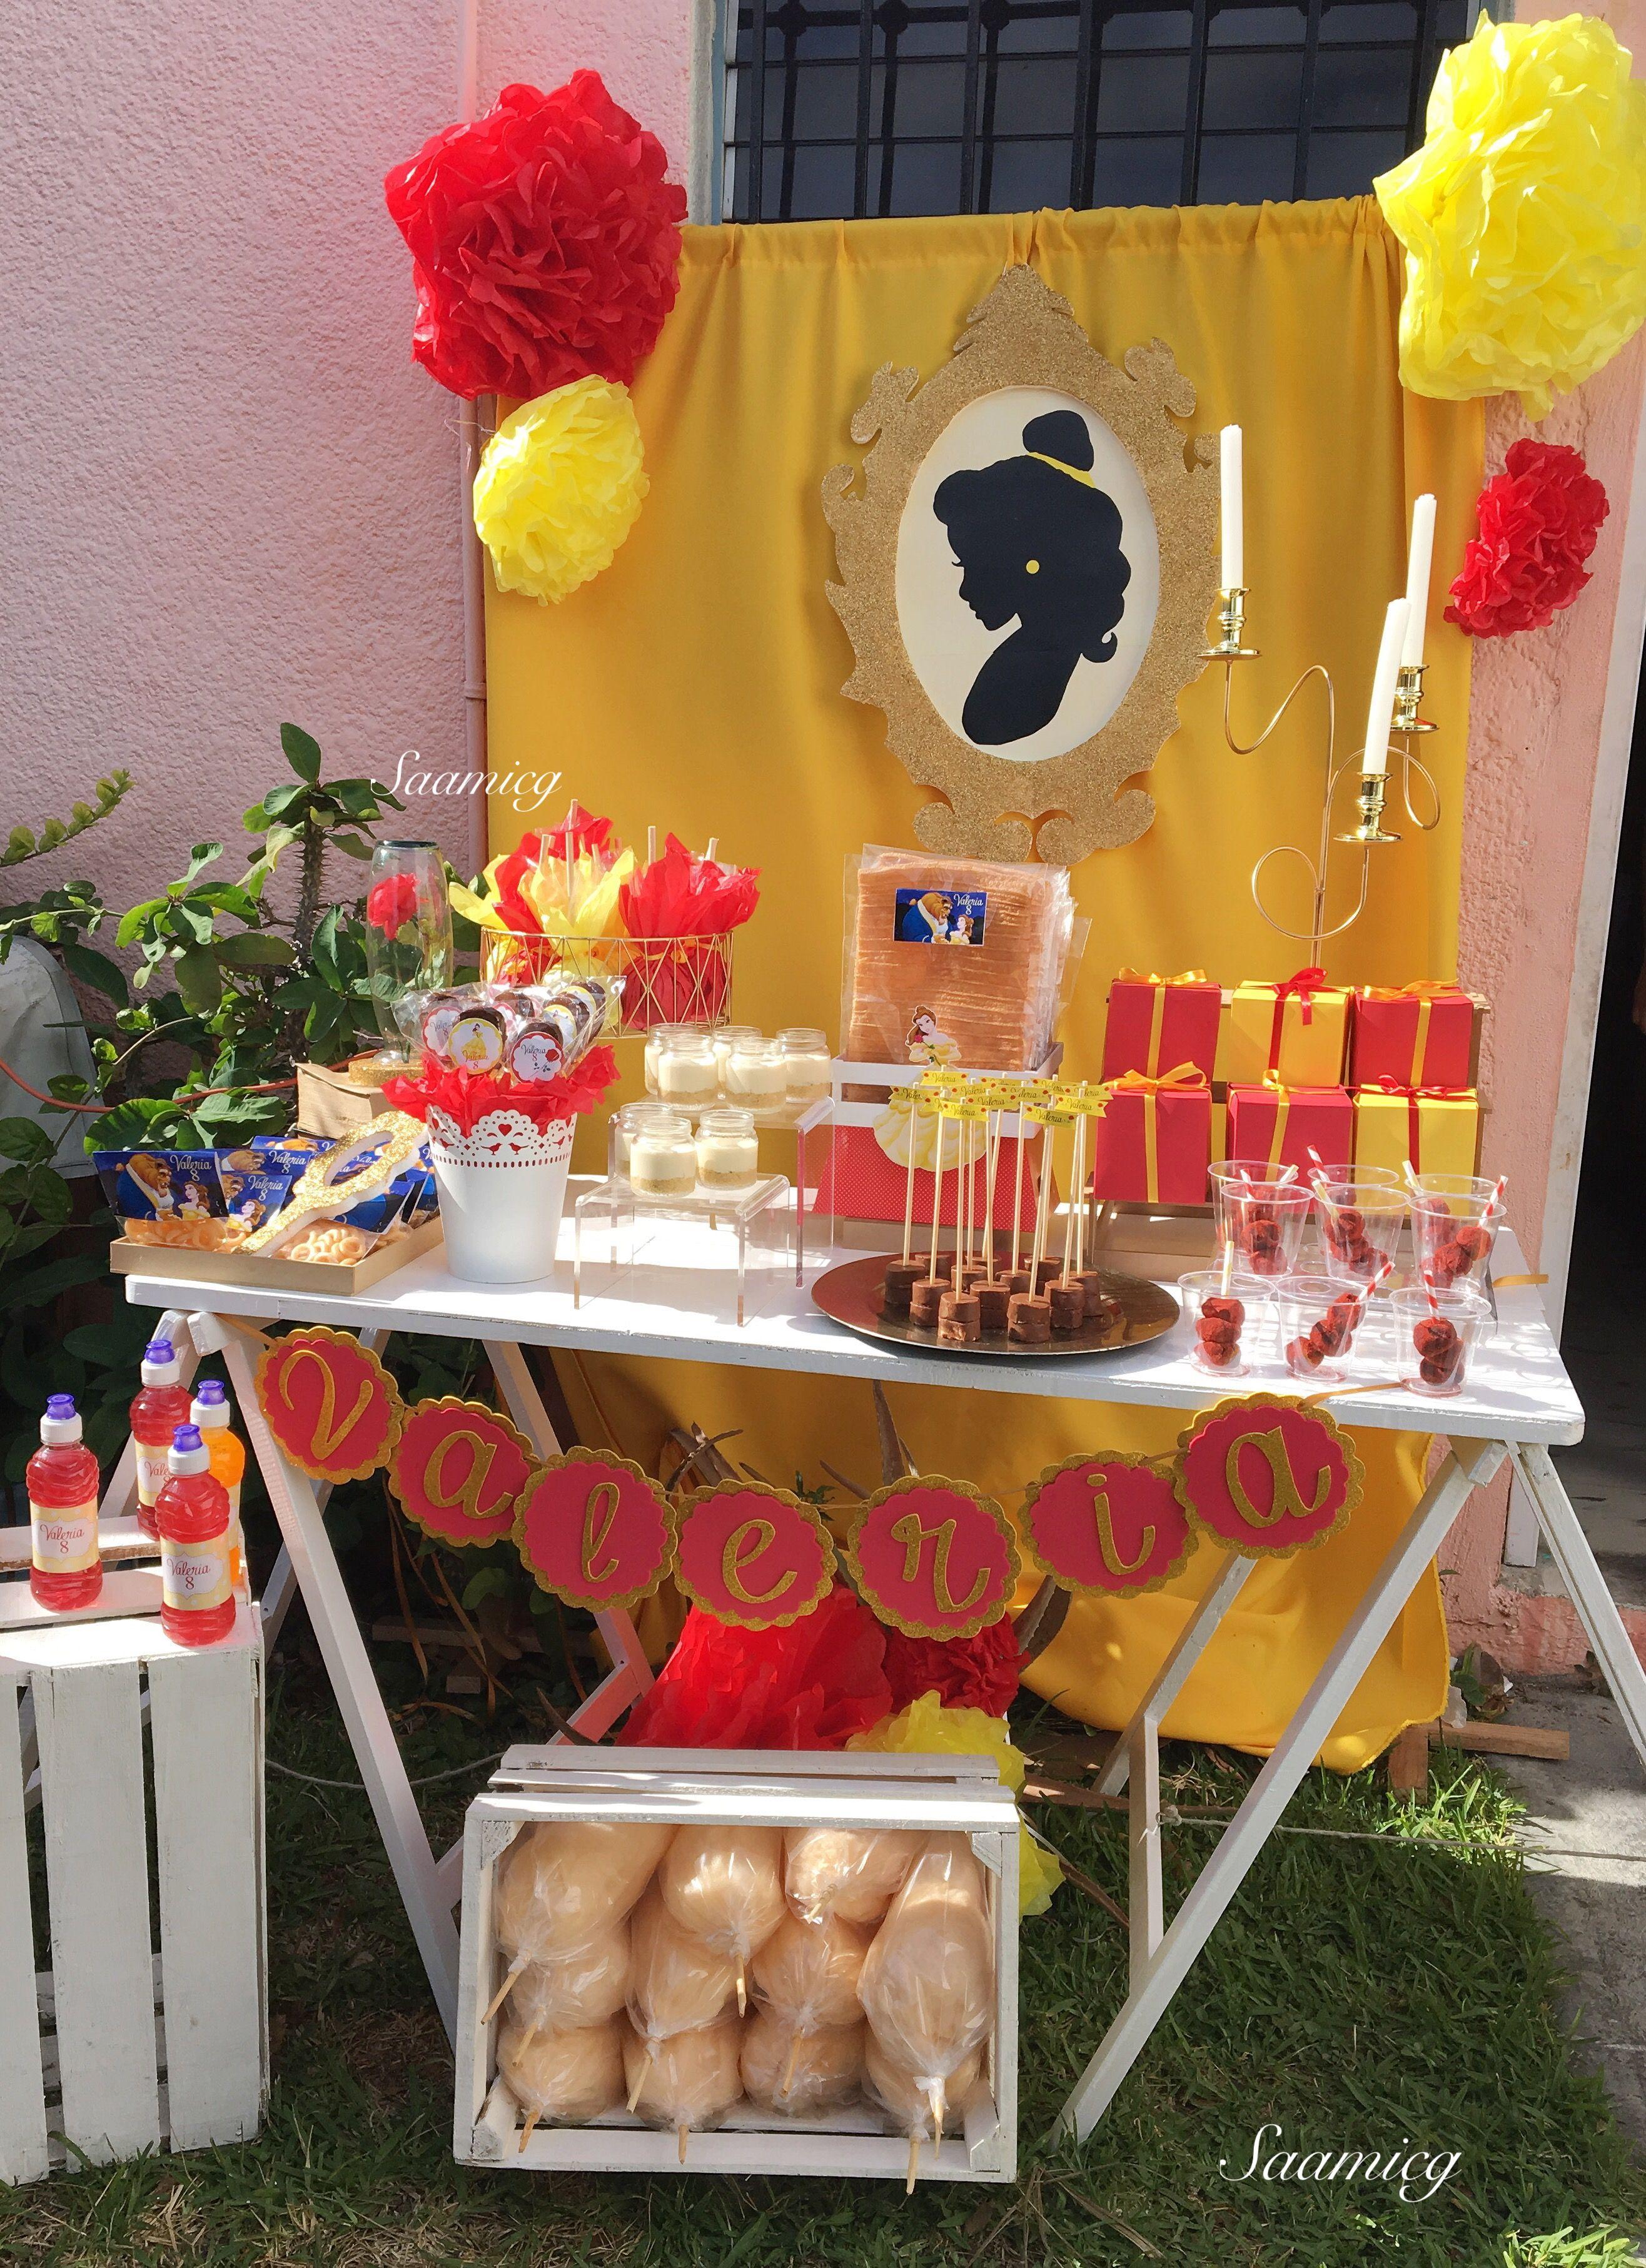 beauty and the beast party idea la bella y la bestia fiesta candy bar created